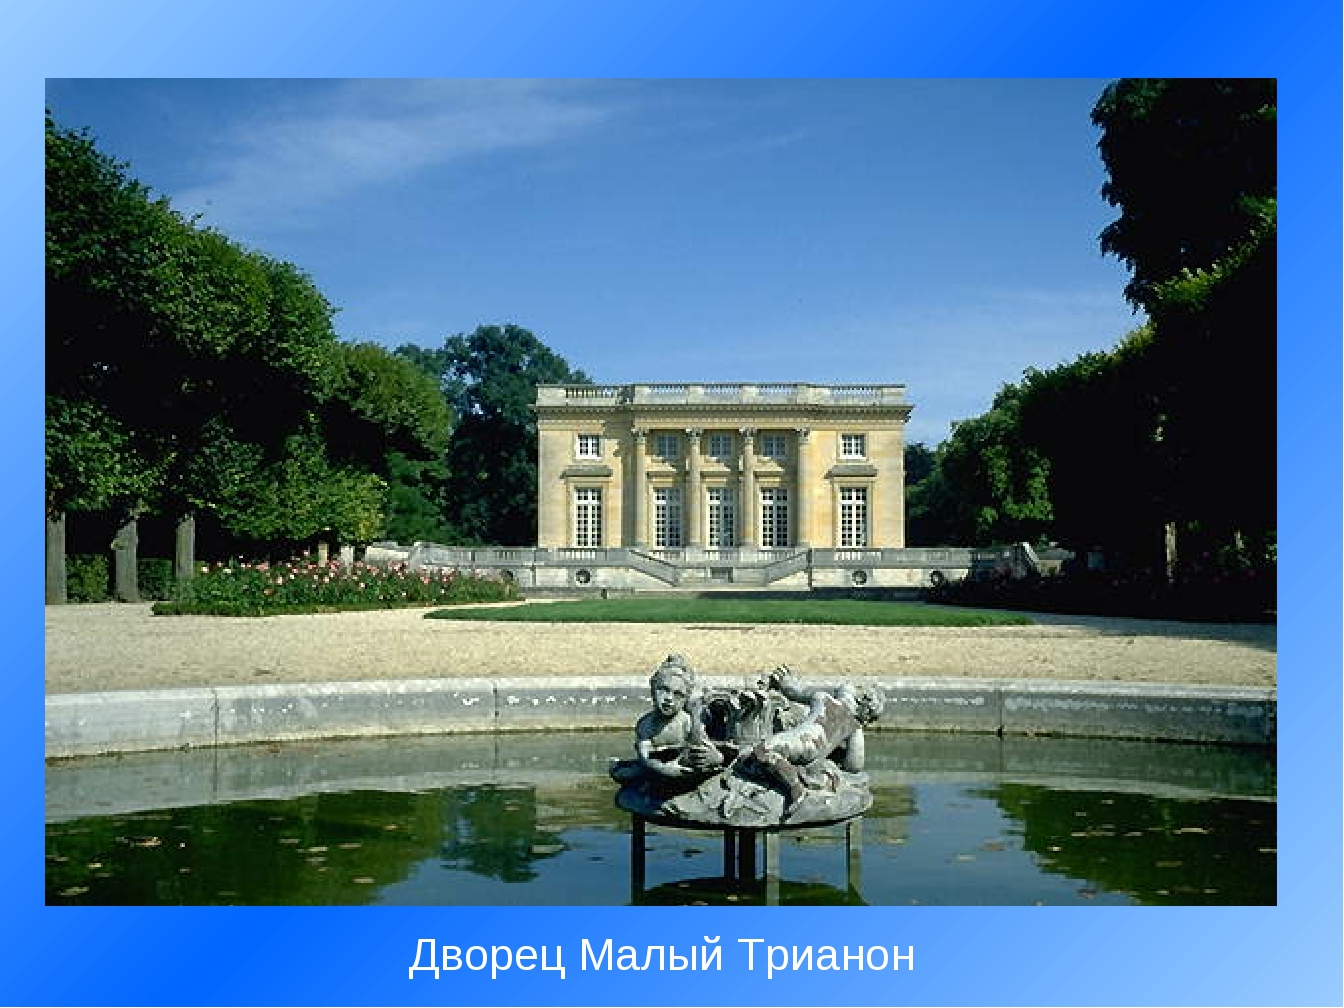 Дворец Малый Трианон